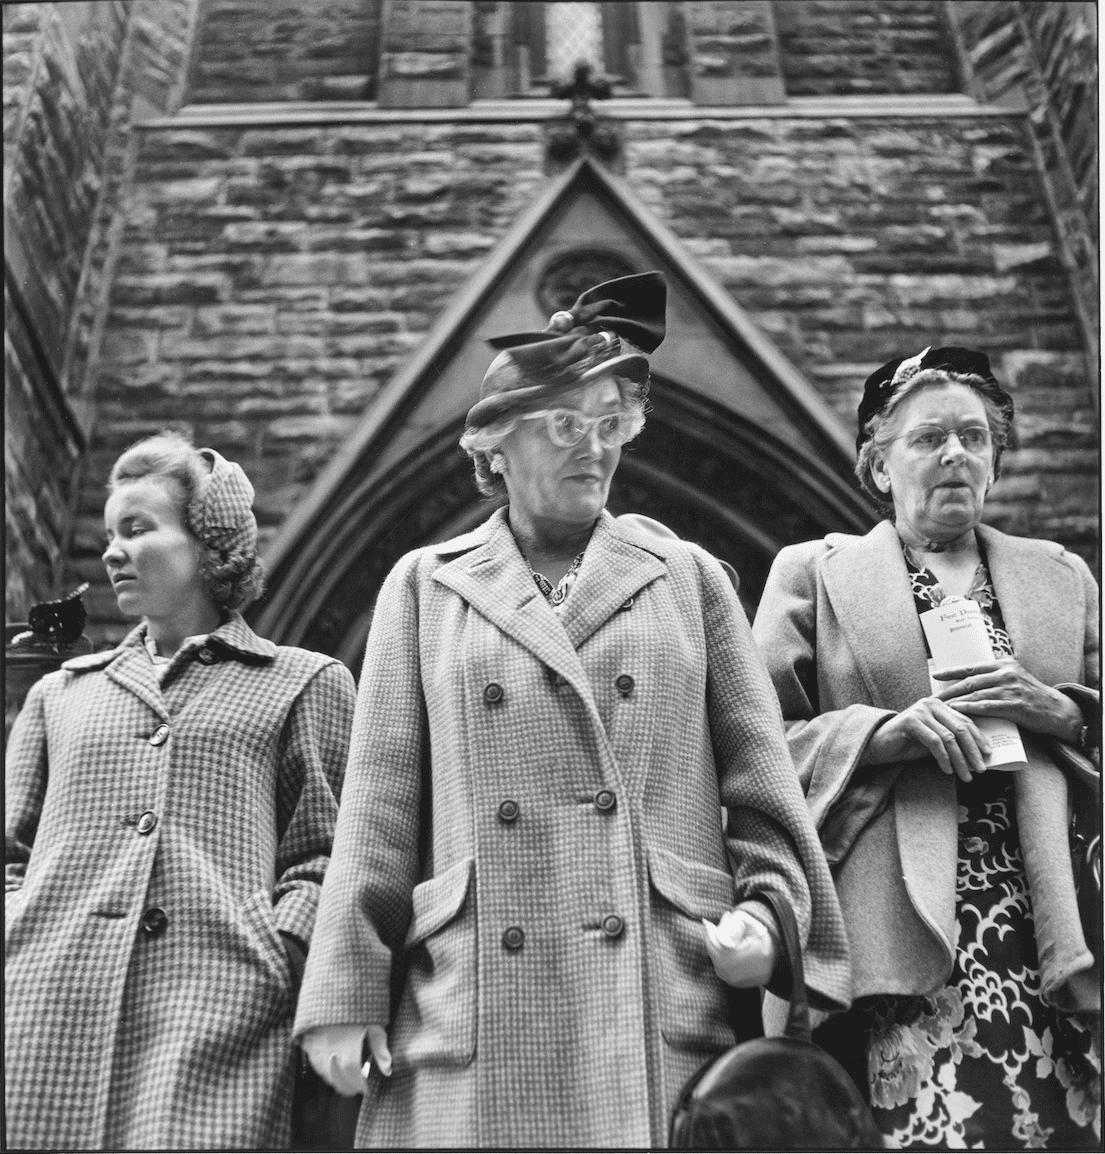 Pittsburgh 1950, A Long-lost Portfolio By Elliot Erwitt